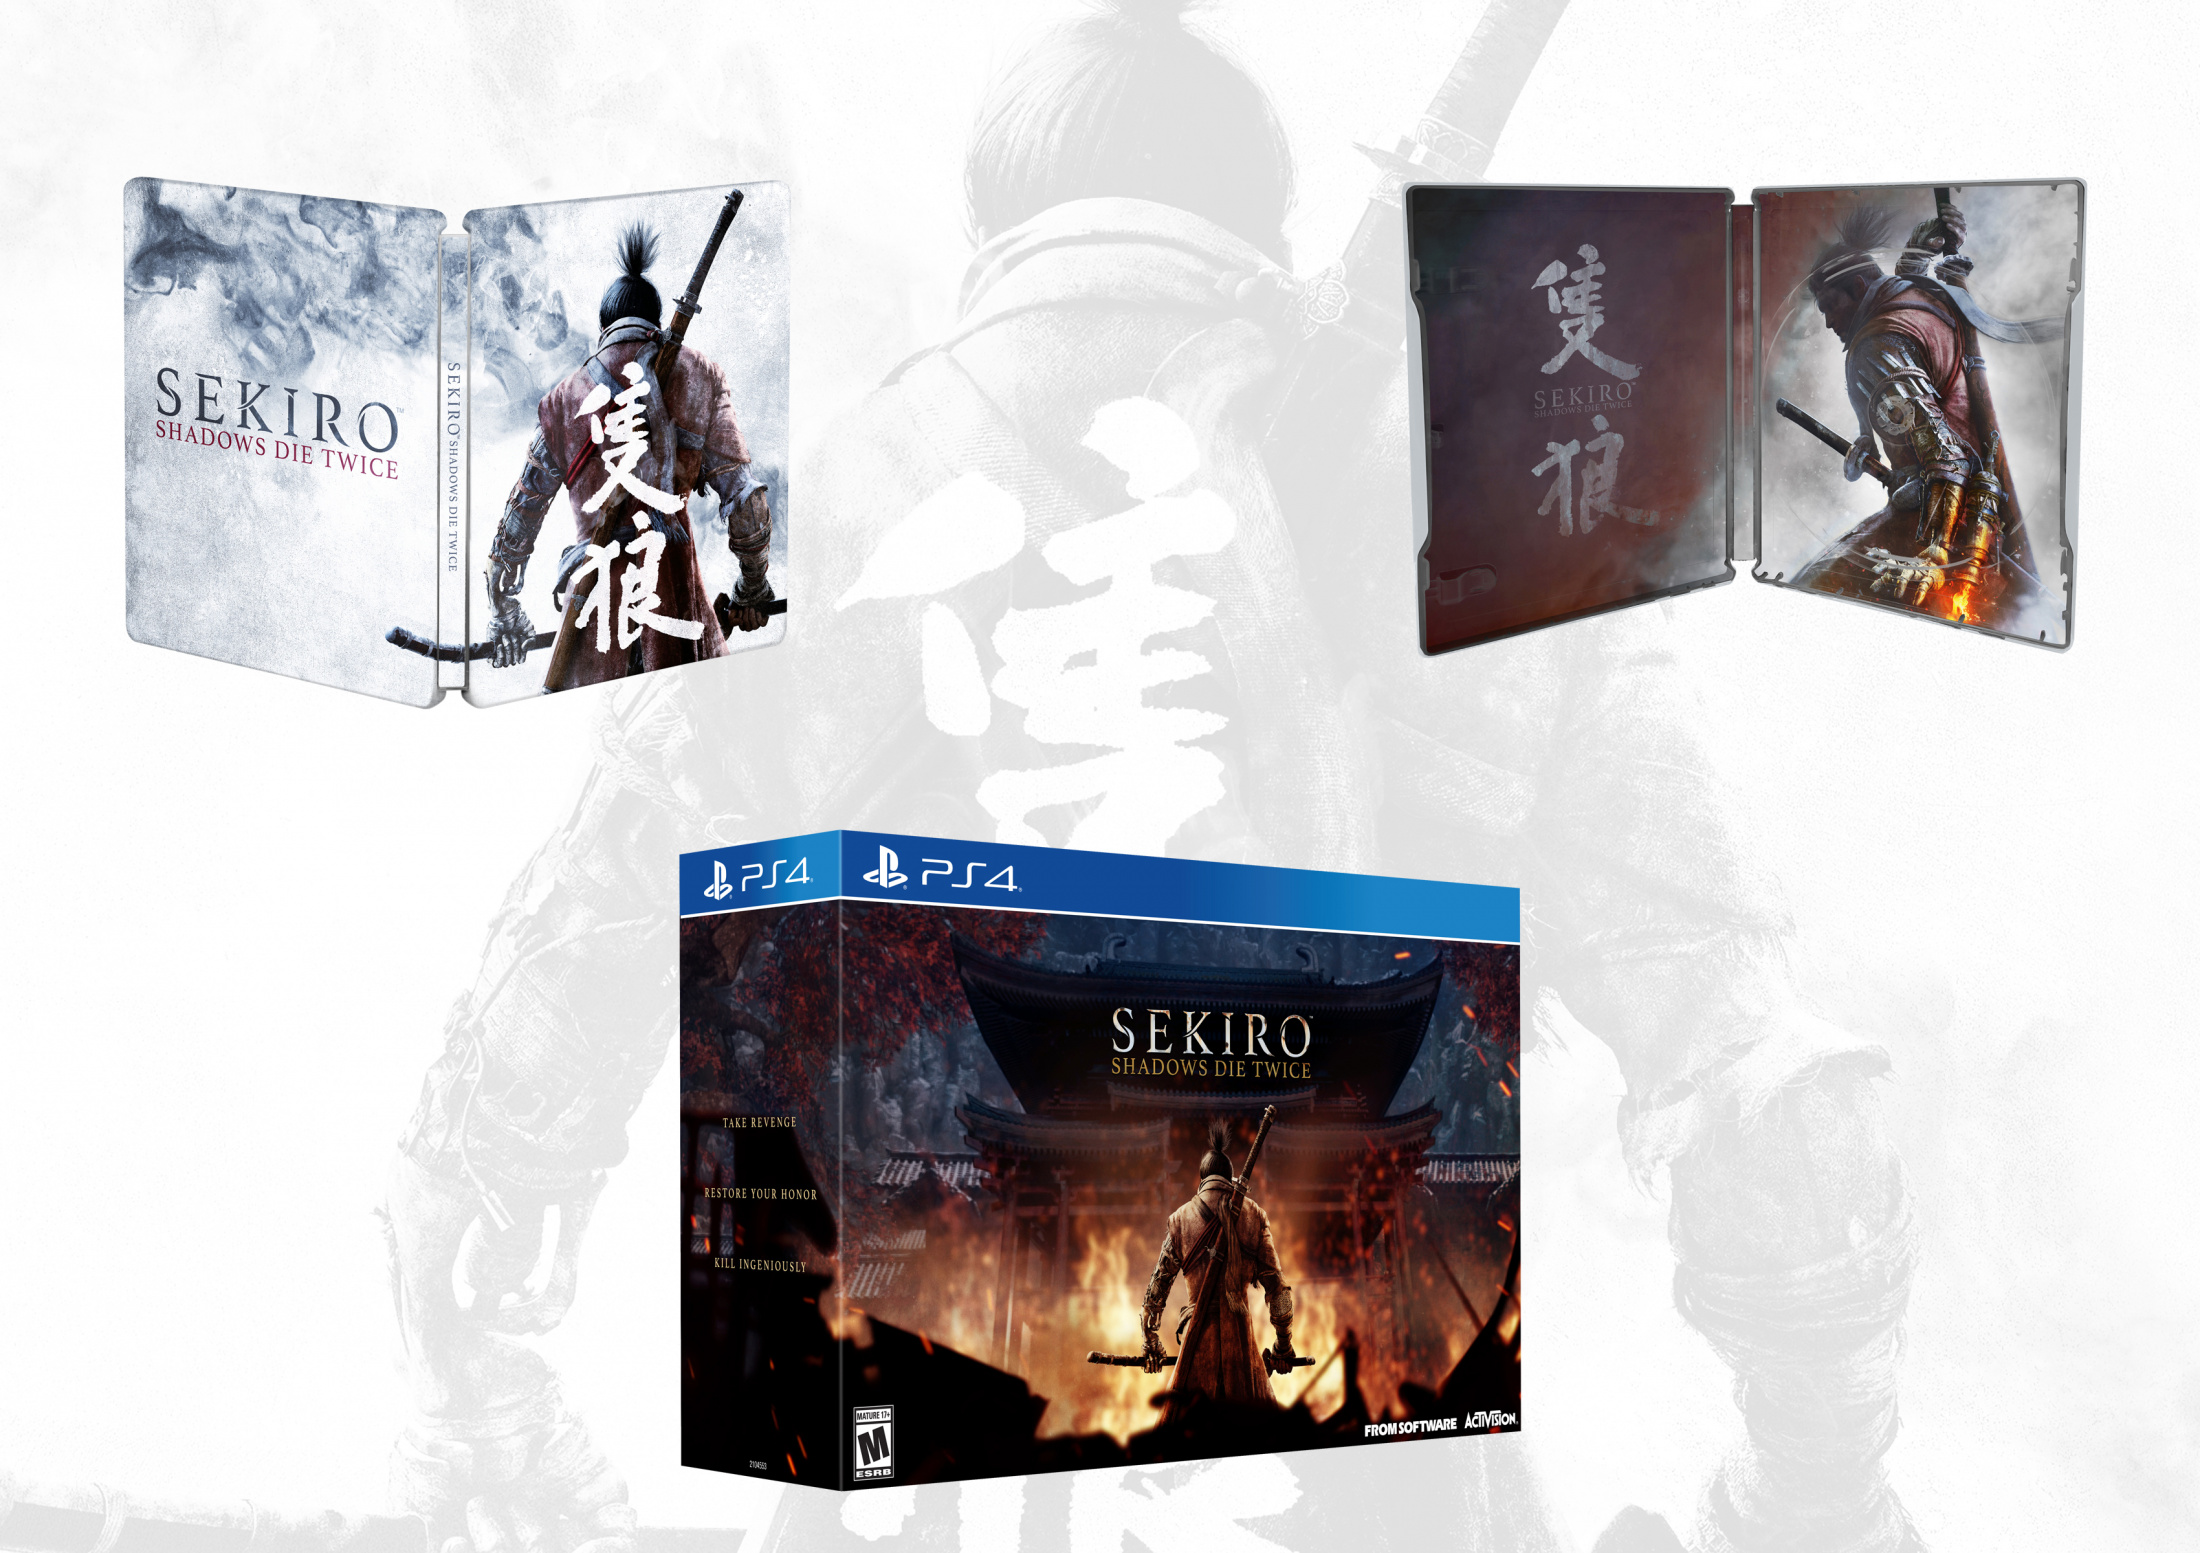 Thumbnail for Sekiro: Shadows Die Twice- Packaging